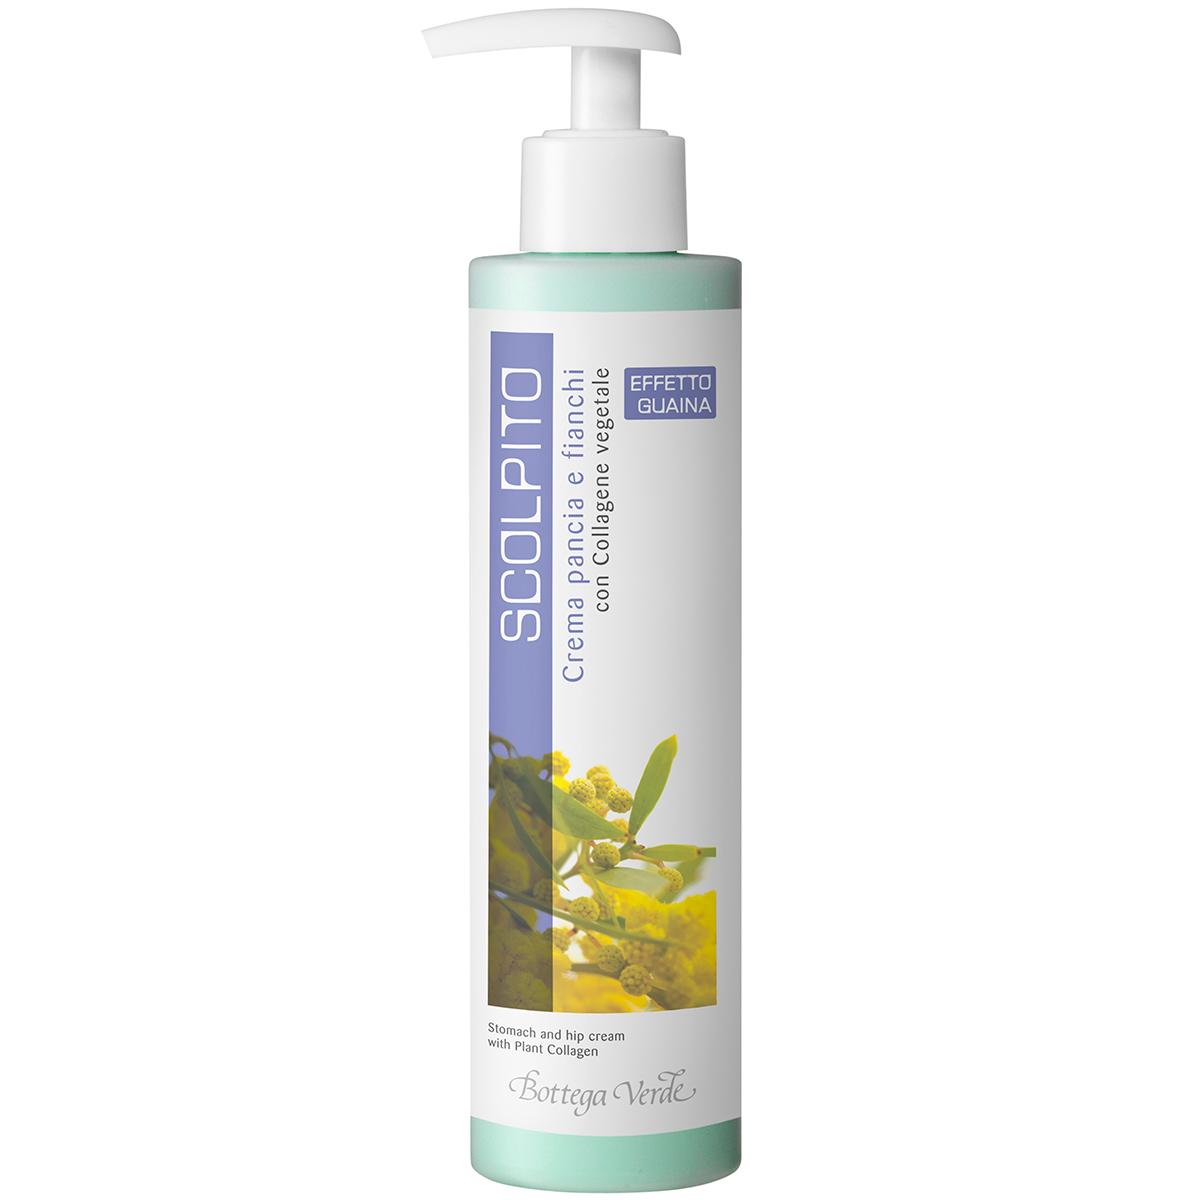 Scolpito - Crema Cu Colagen Vegetal Pentru Abdomen Si Solduri